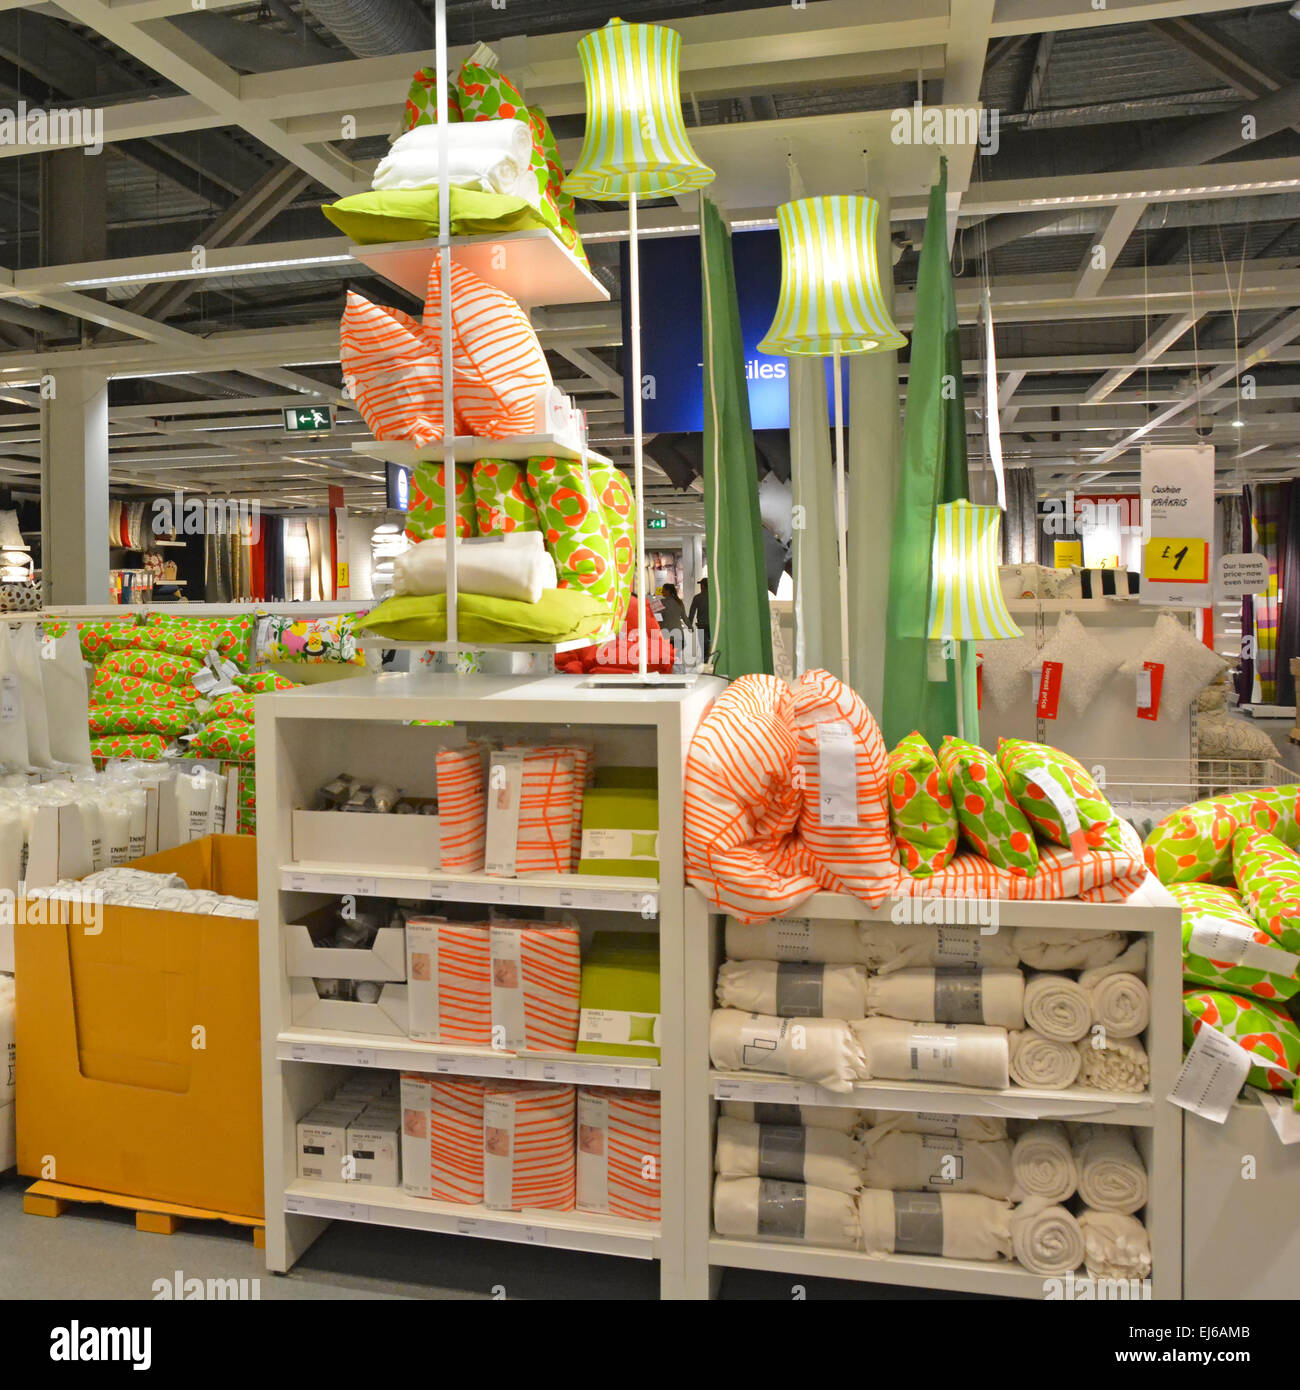 Interior Of Soft Furnishings Department In UK Ikea Store